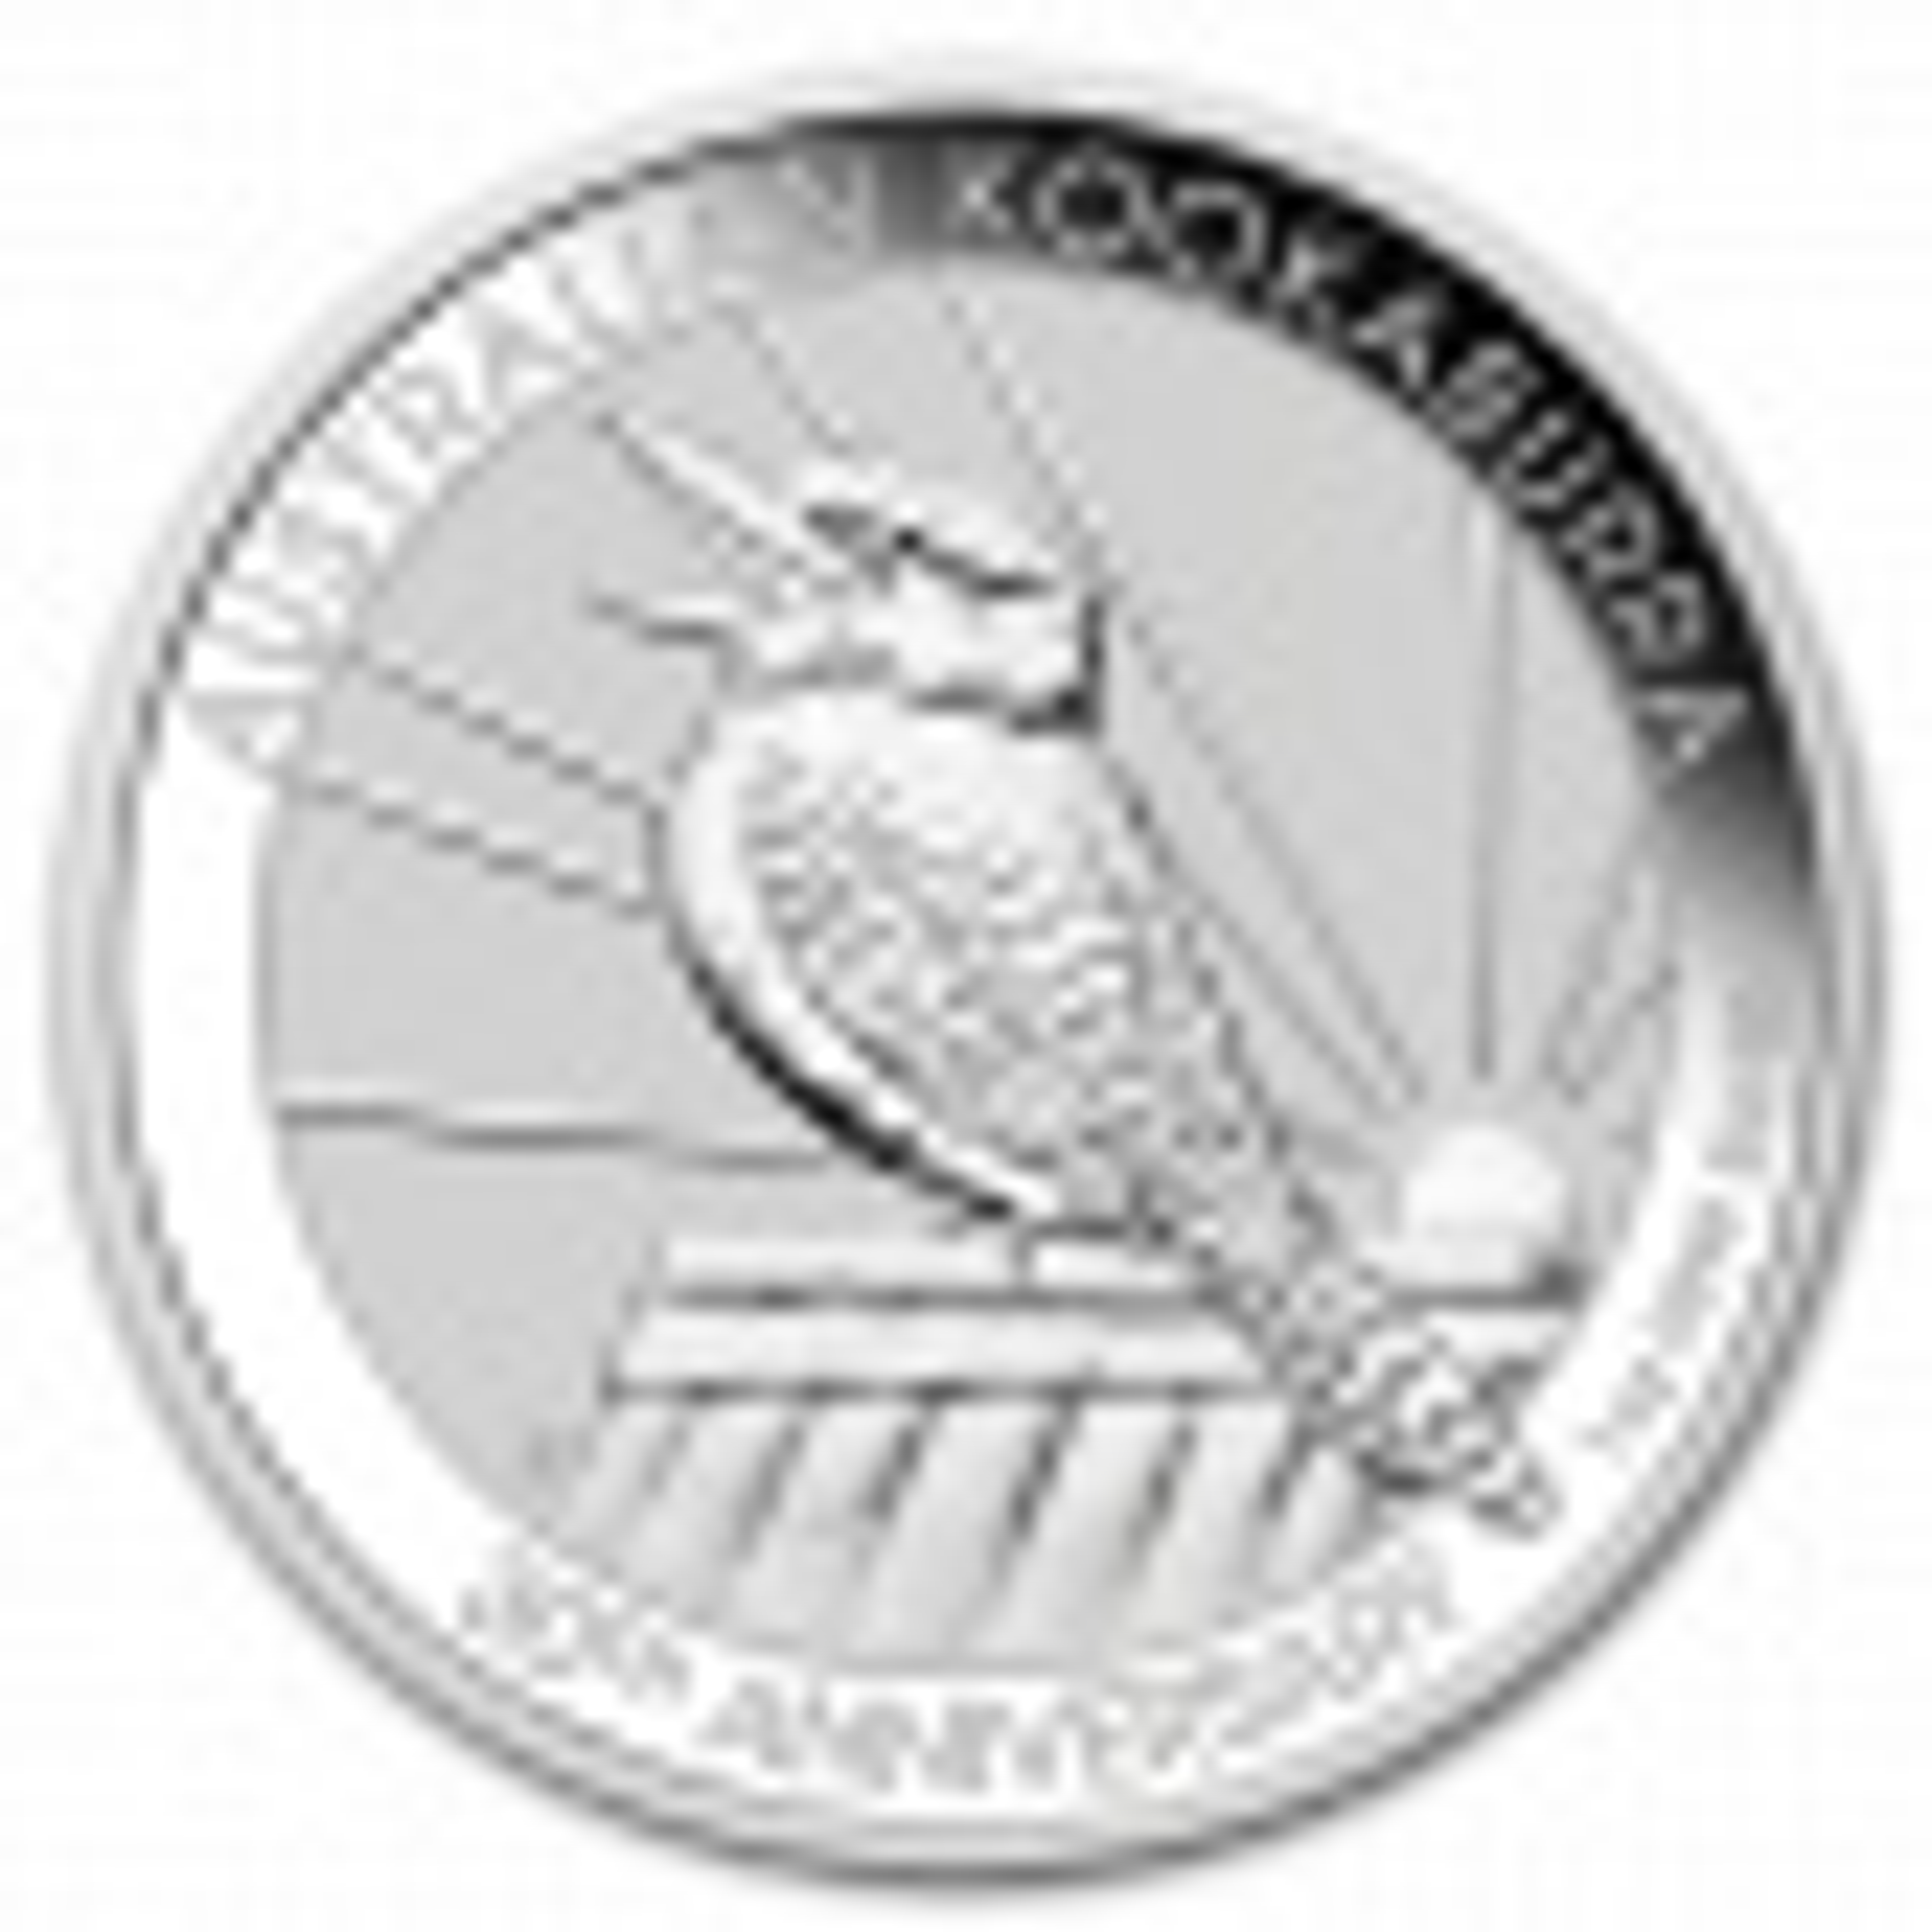 1 Troy ounce silver coin Kookaburra 2020 front